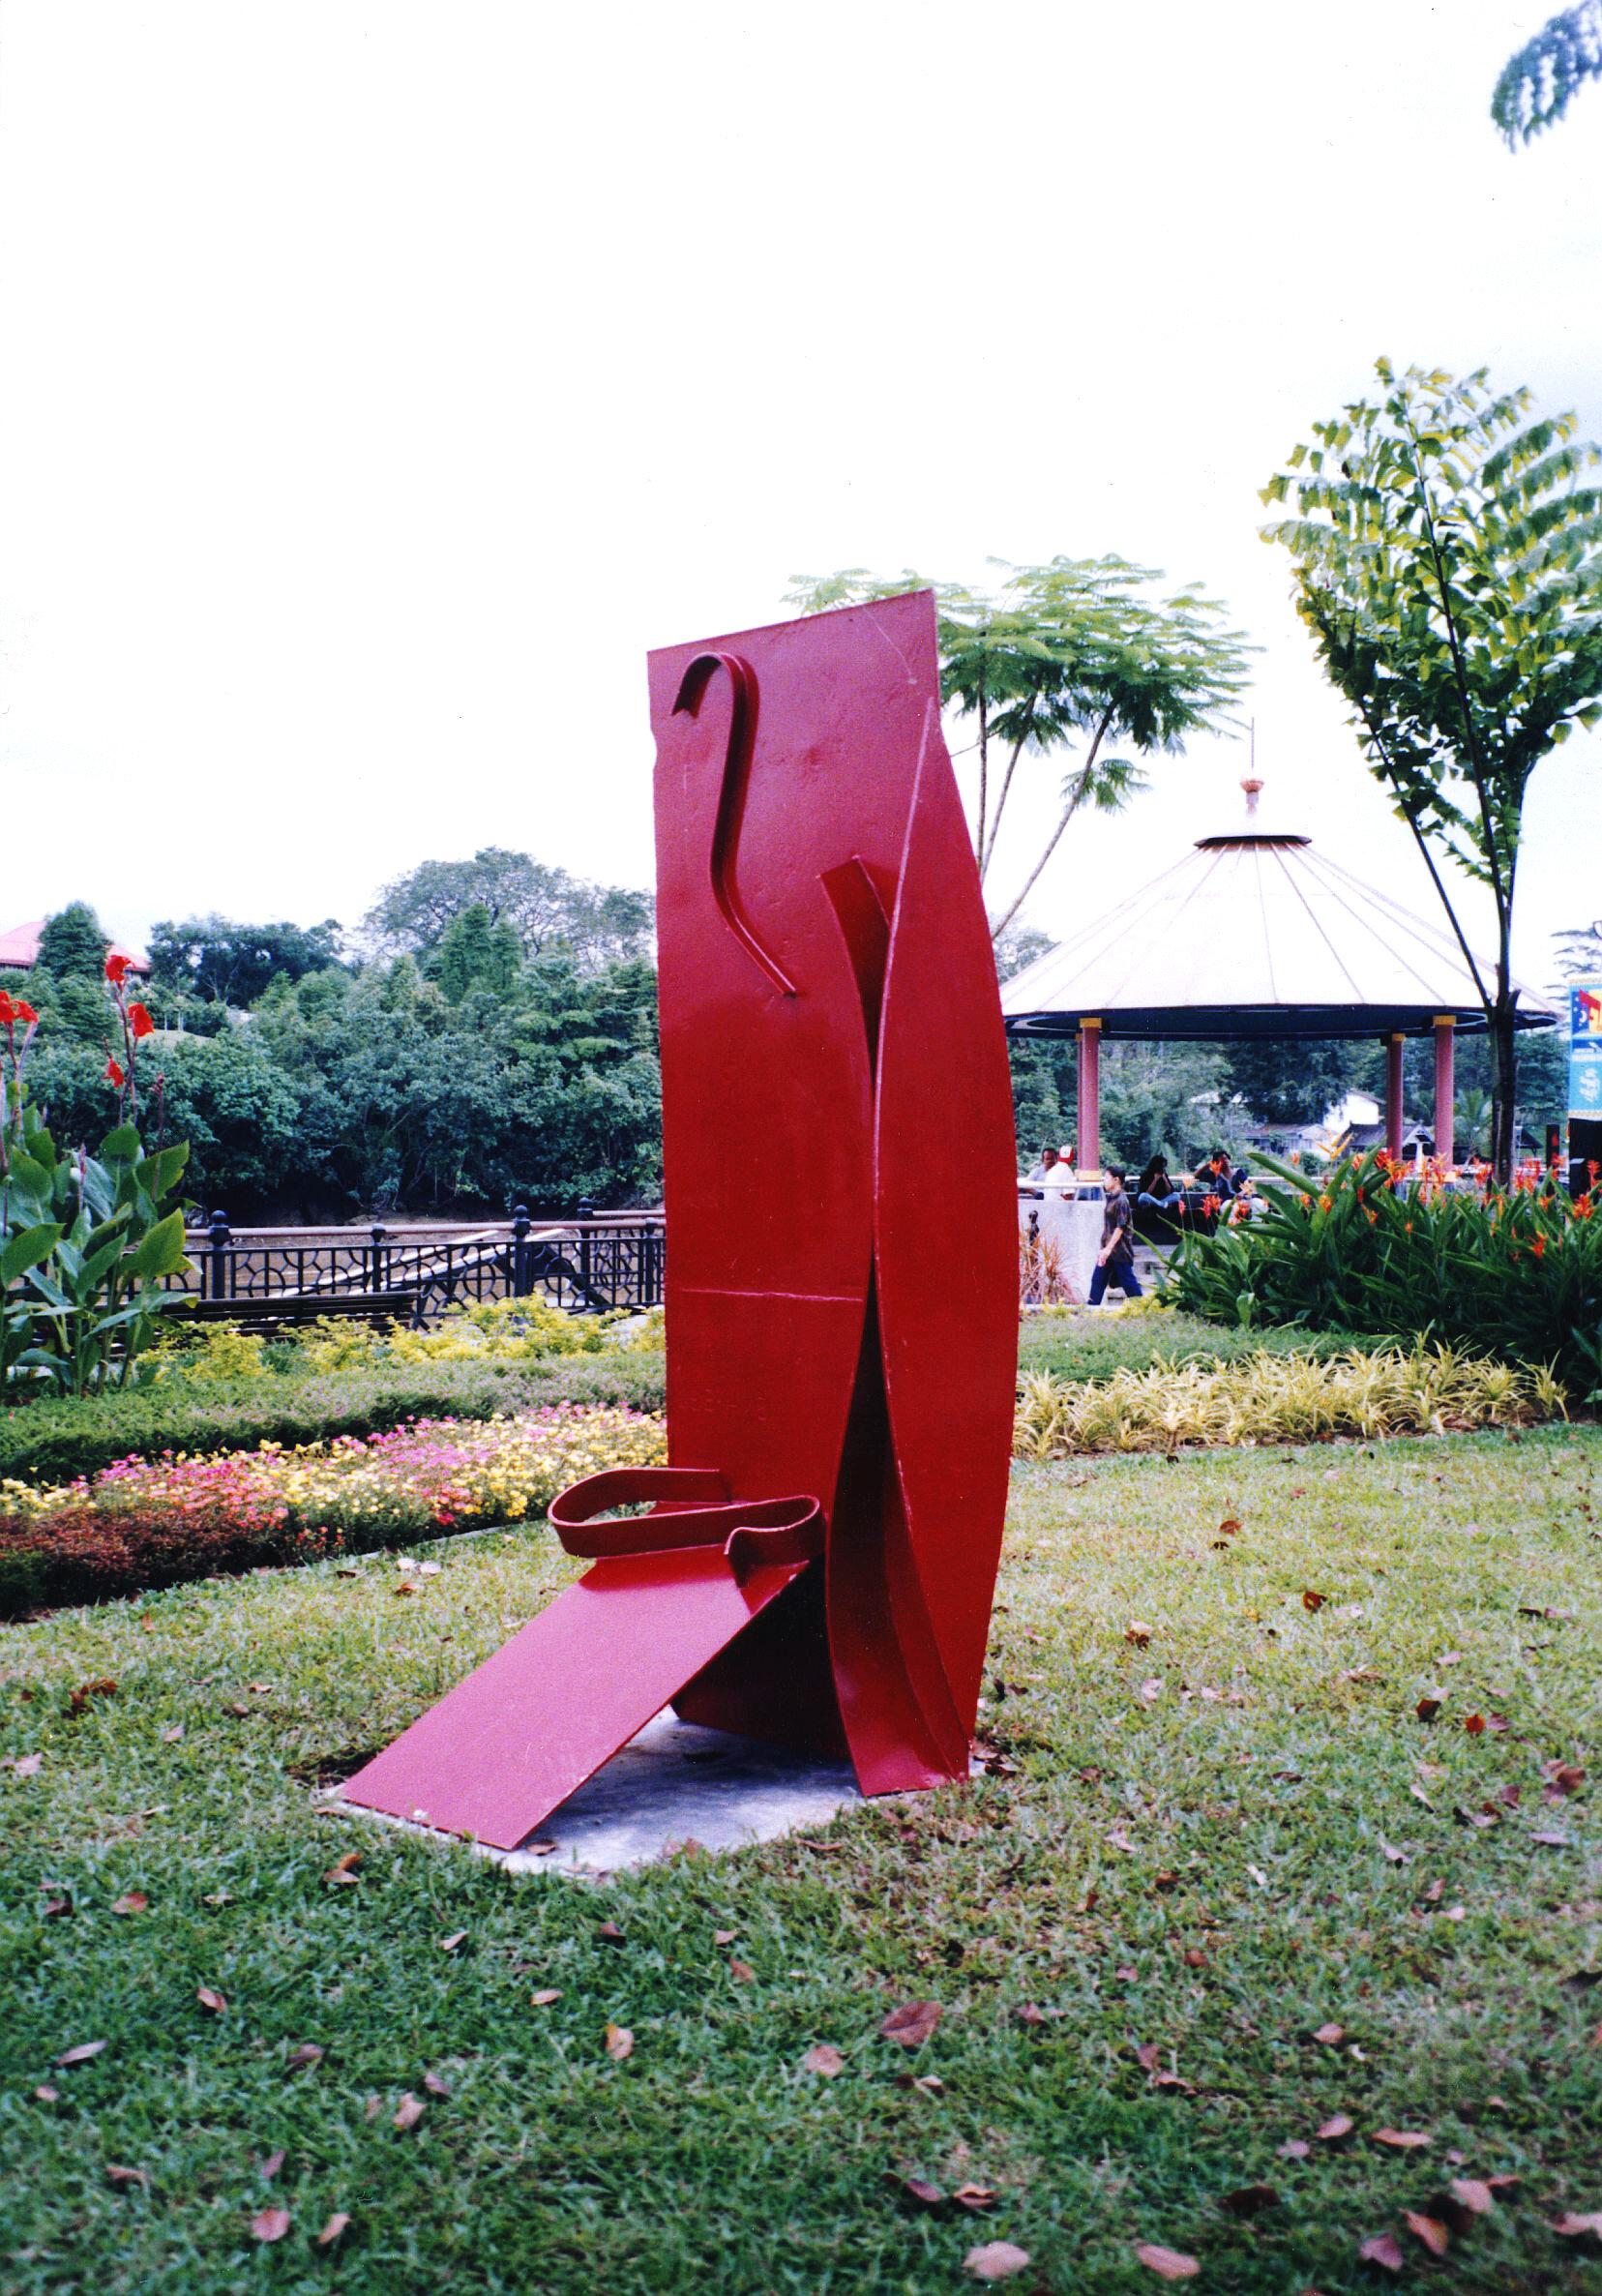 Untitled 5, 1990